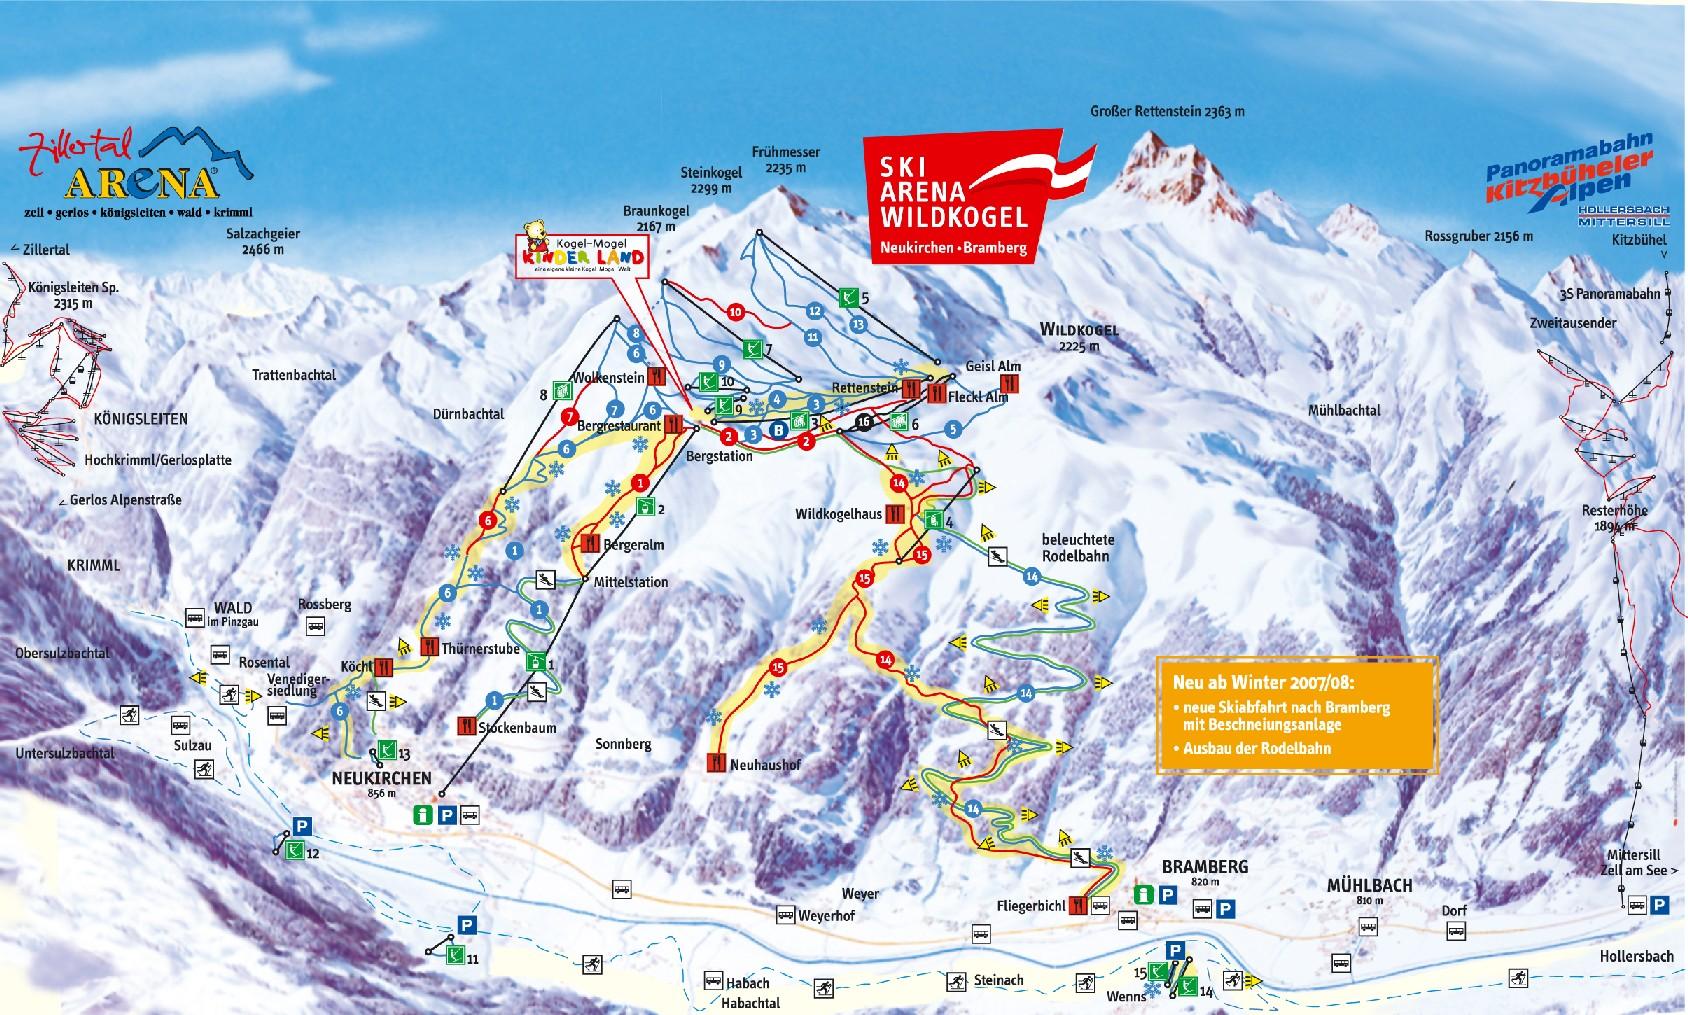 Neukirchen/Bramberg-Ski-Arena Wildkogel Piste / Trail Map